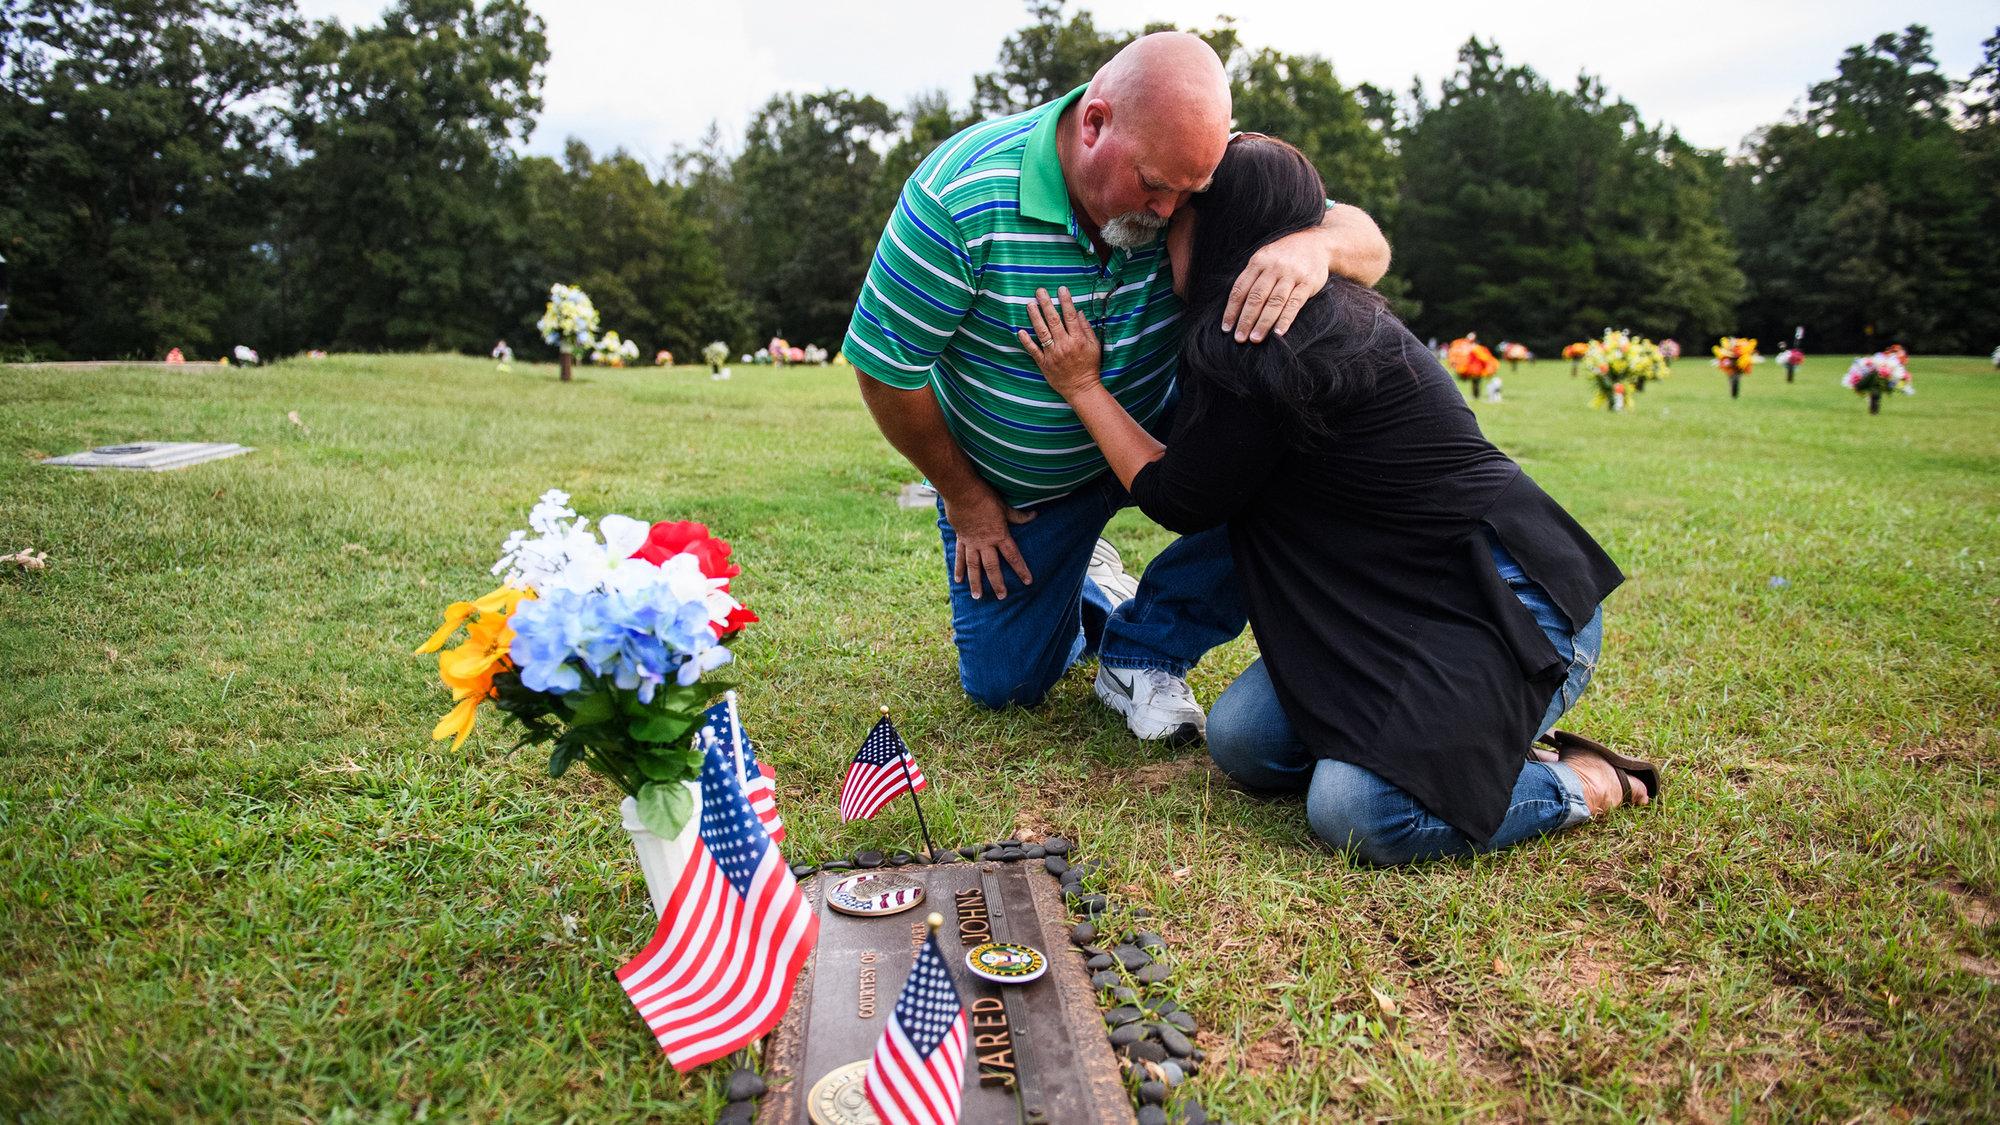 Kevin Johns comforts Kathy Bowling at their son Jared Johns' grave at Cannon Memorial Park in Fountain Inn, South Carolina.